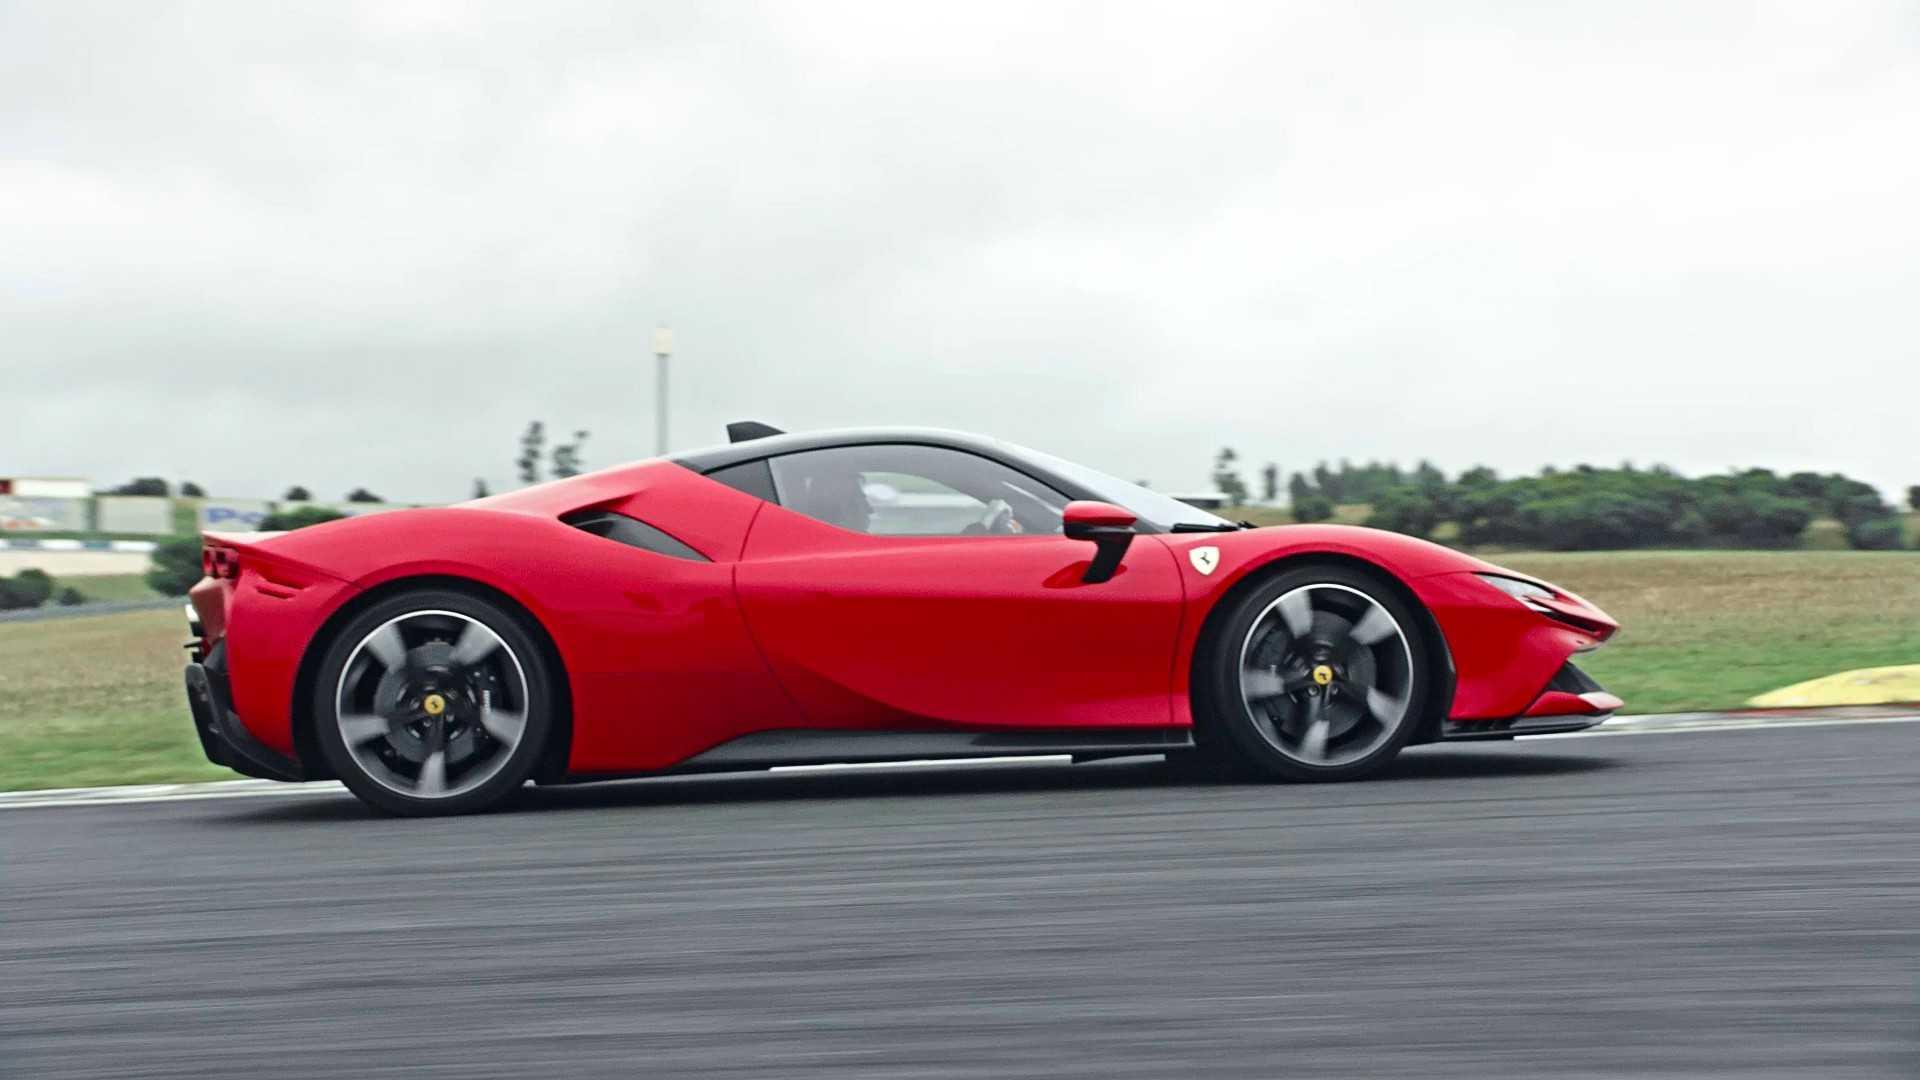 56 Concept of Ferrari B 2020 Redesign and Concept for Ferrari B 2020